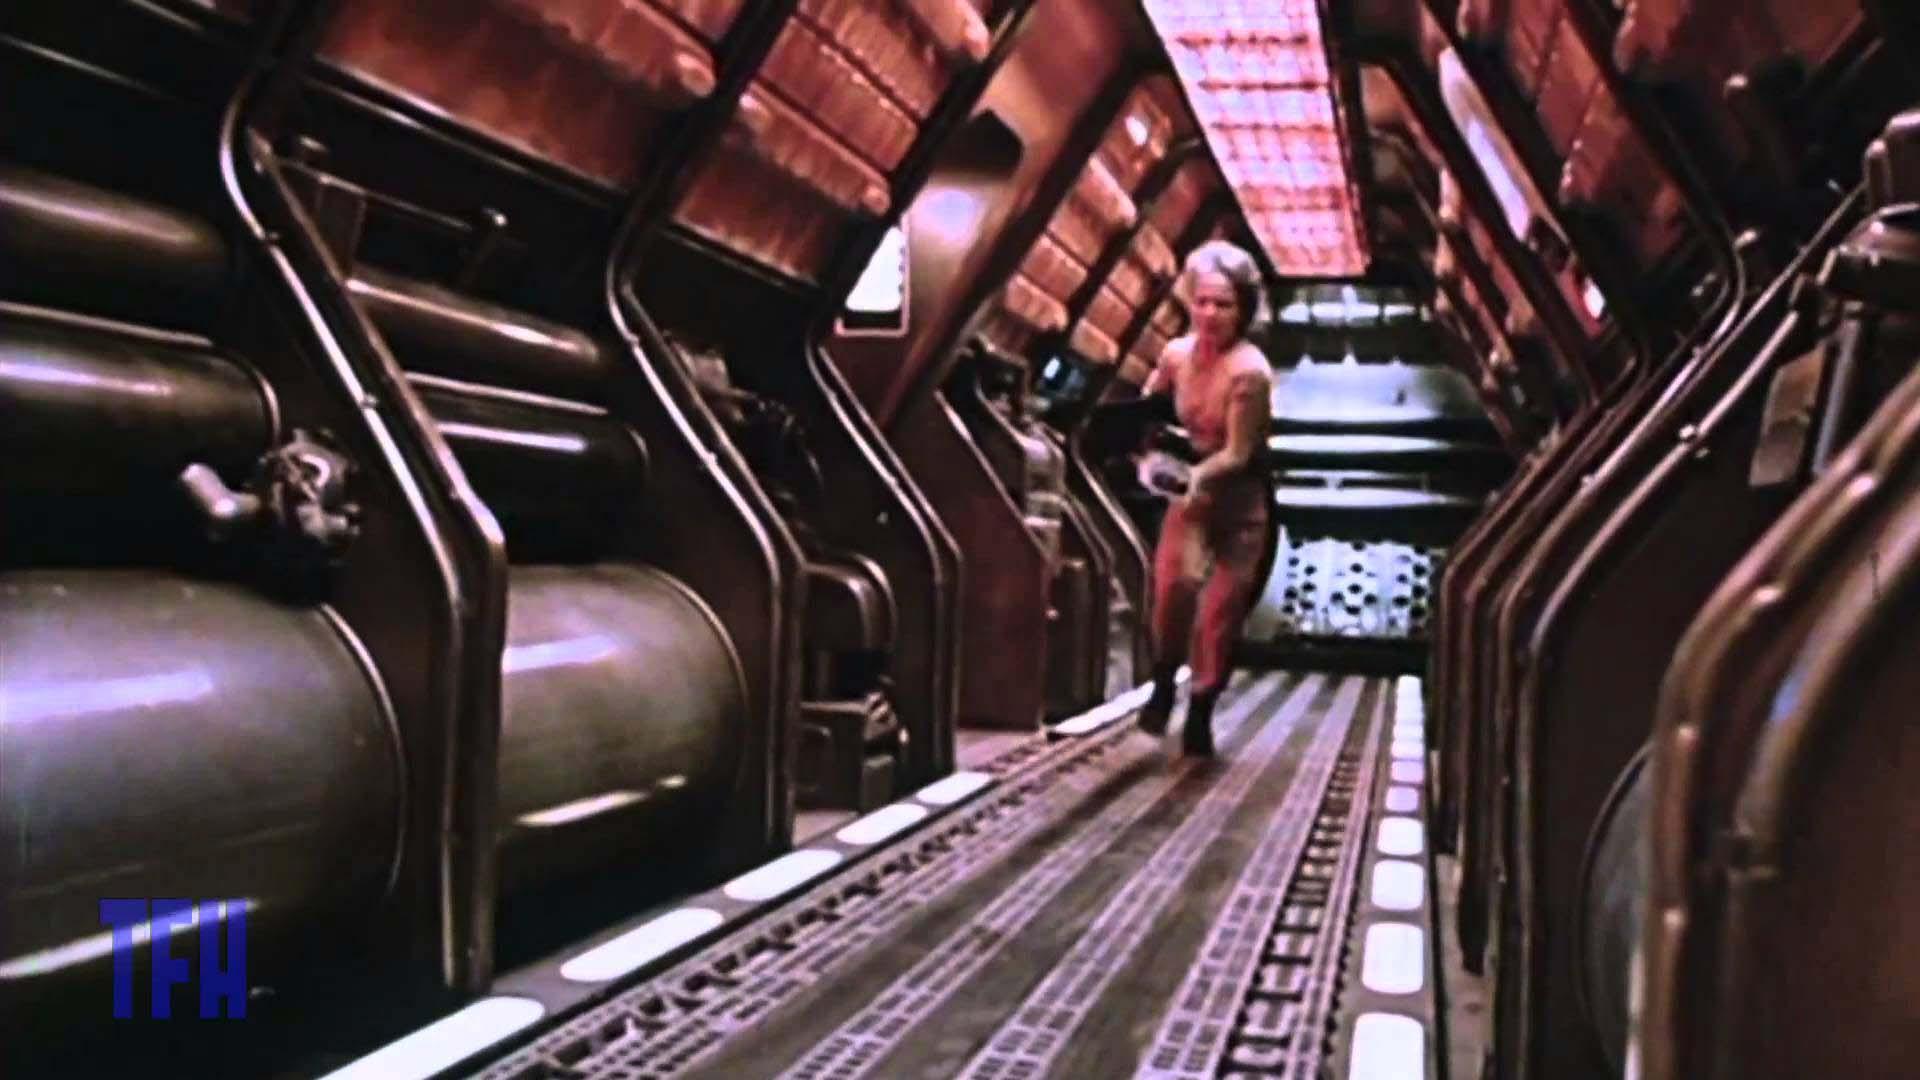 Sigourney weaver in galaxy quest 7